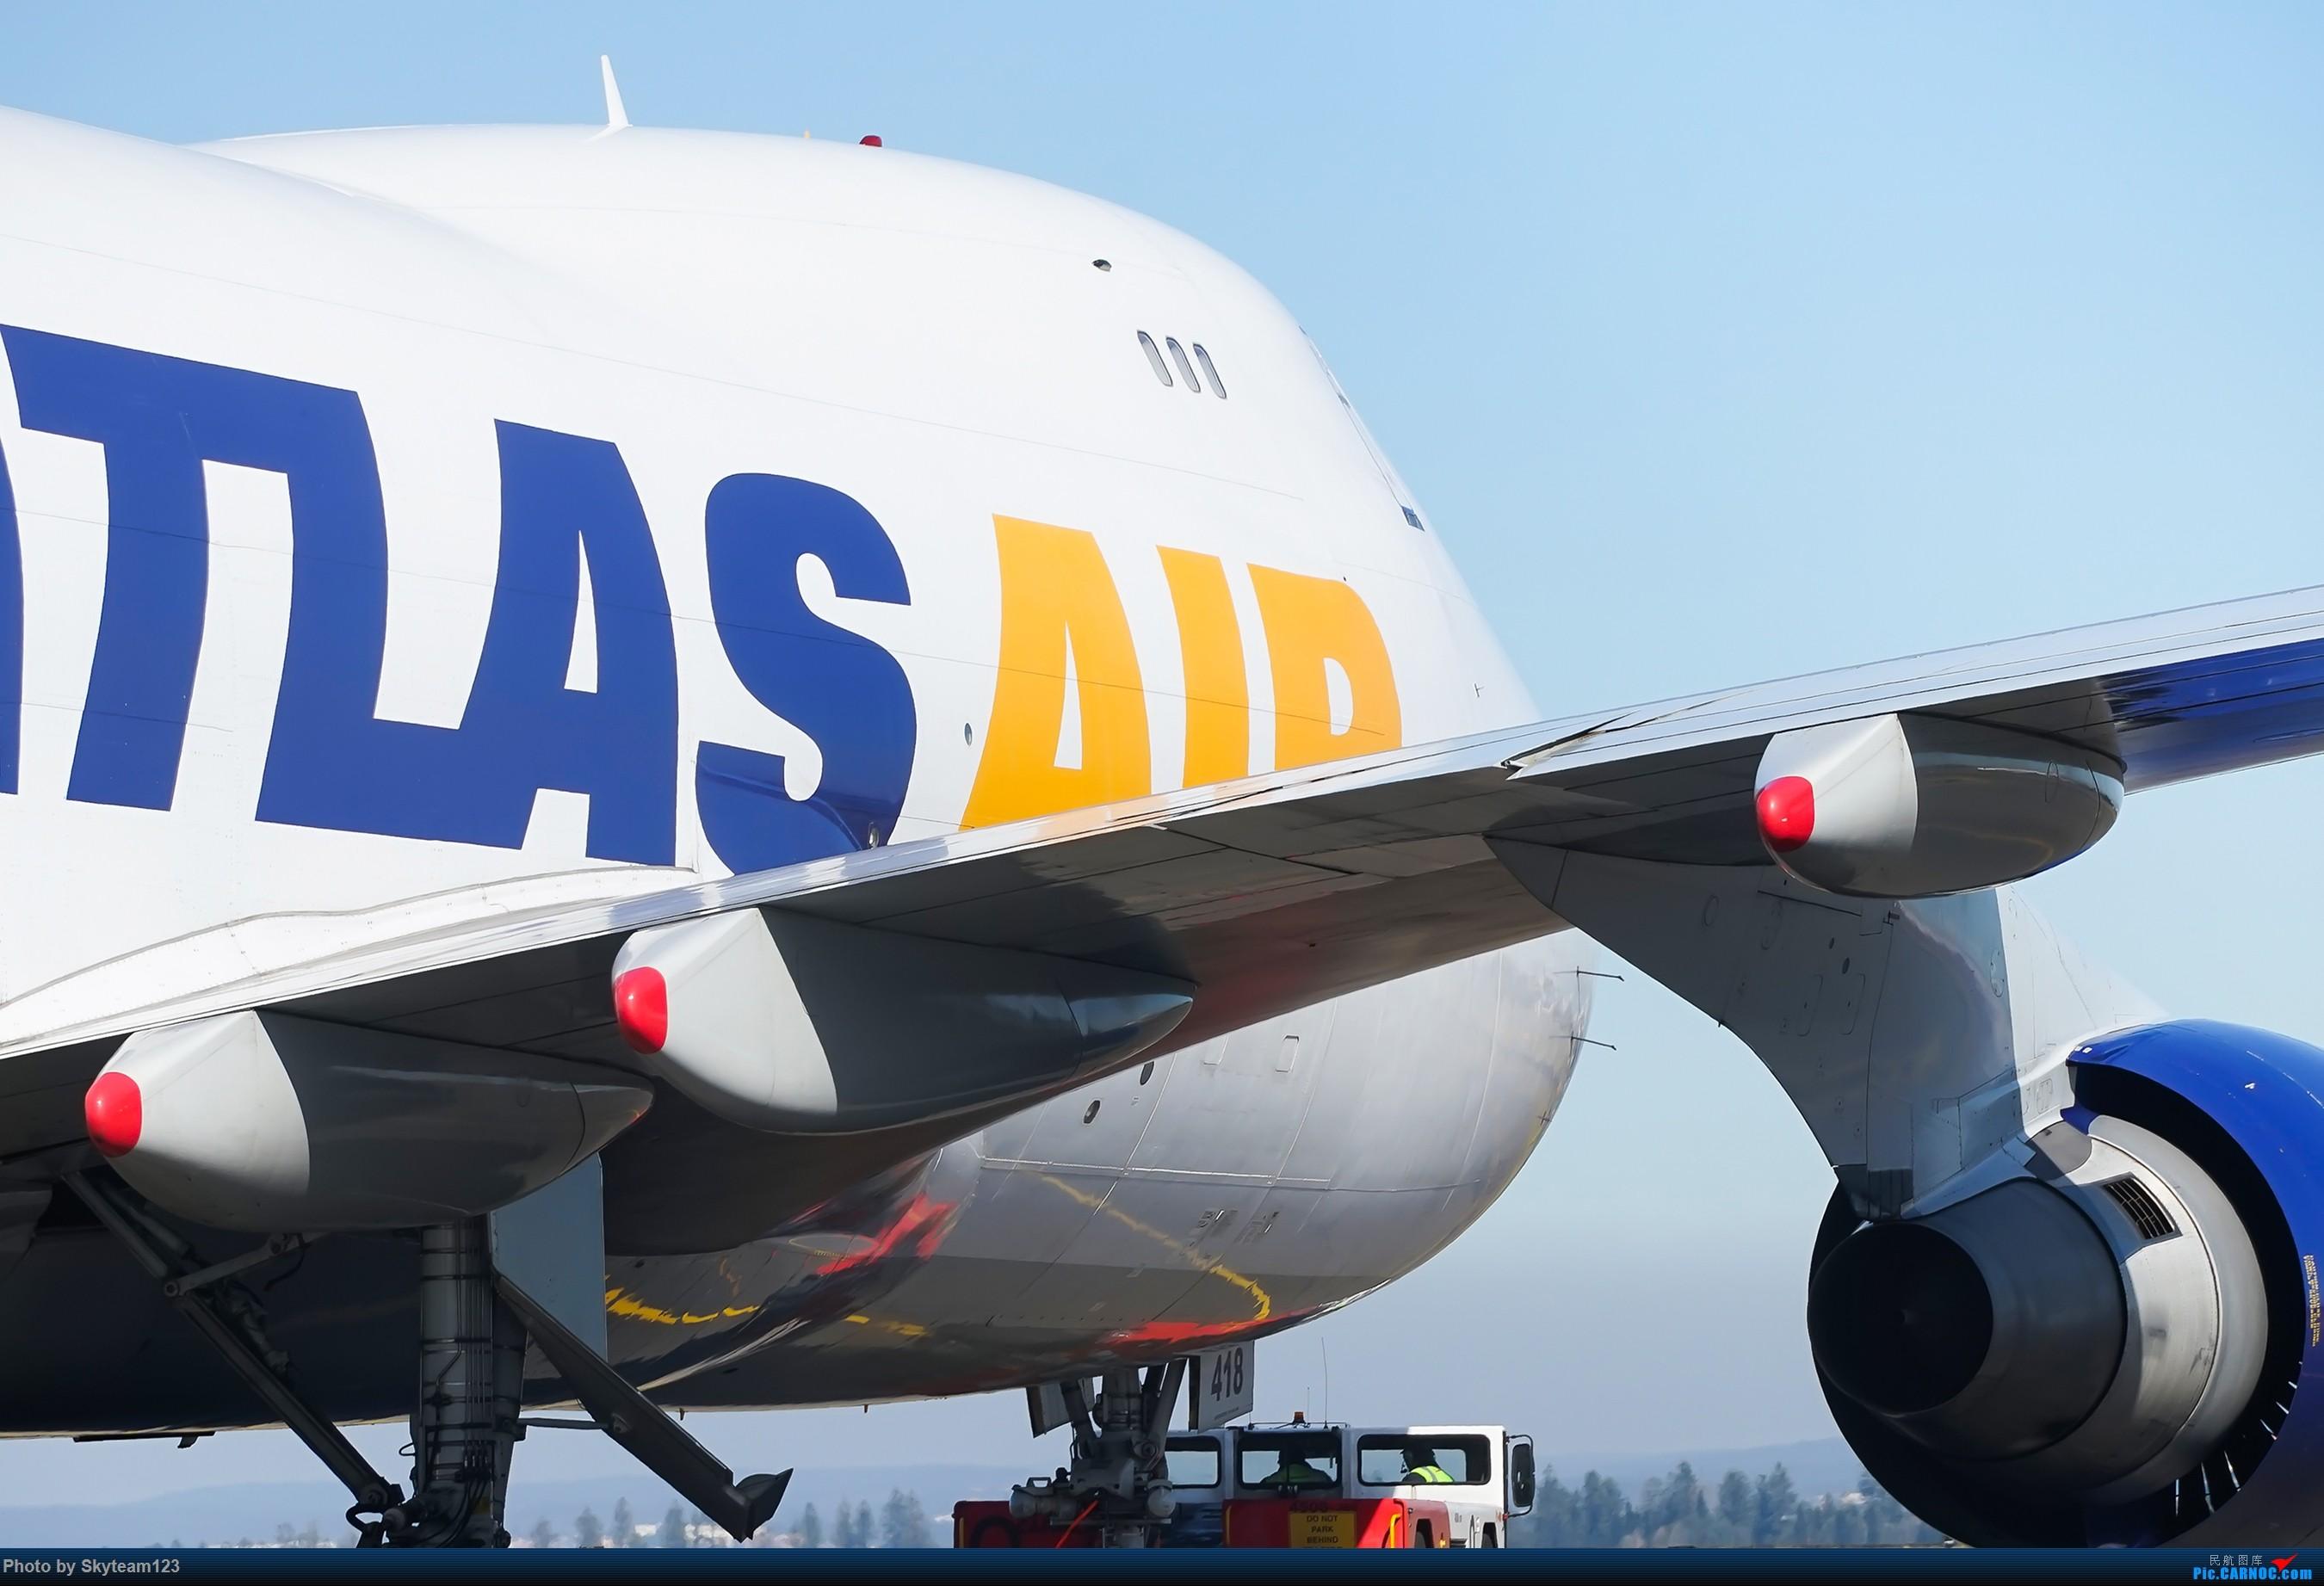 Re:[原创][SYD] 再访Blu EMU停车场 早上34L抵港出发杂图几张 BOEING 747-400F N418MC 澳大利亚悉尼金斯福德·史密斯机场